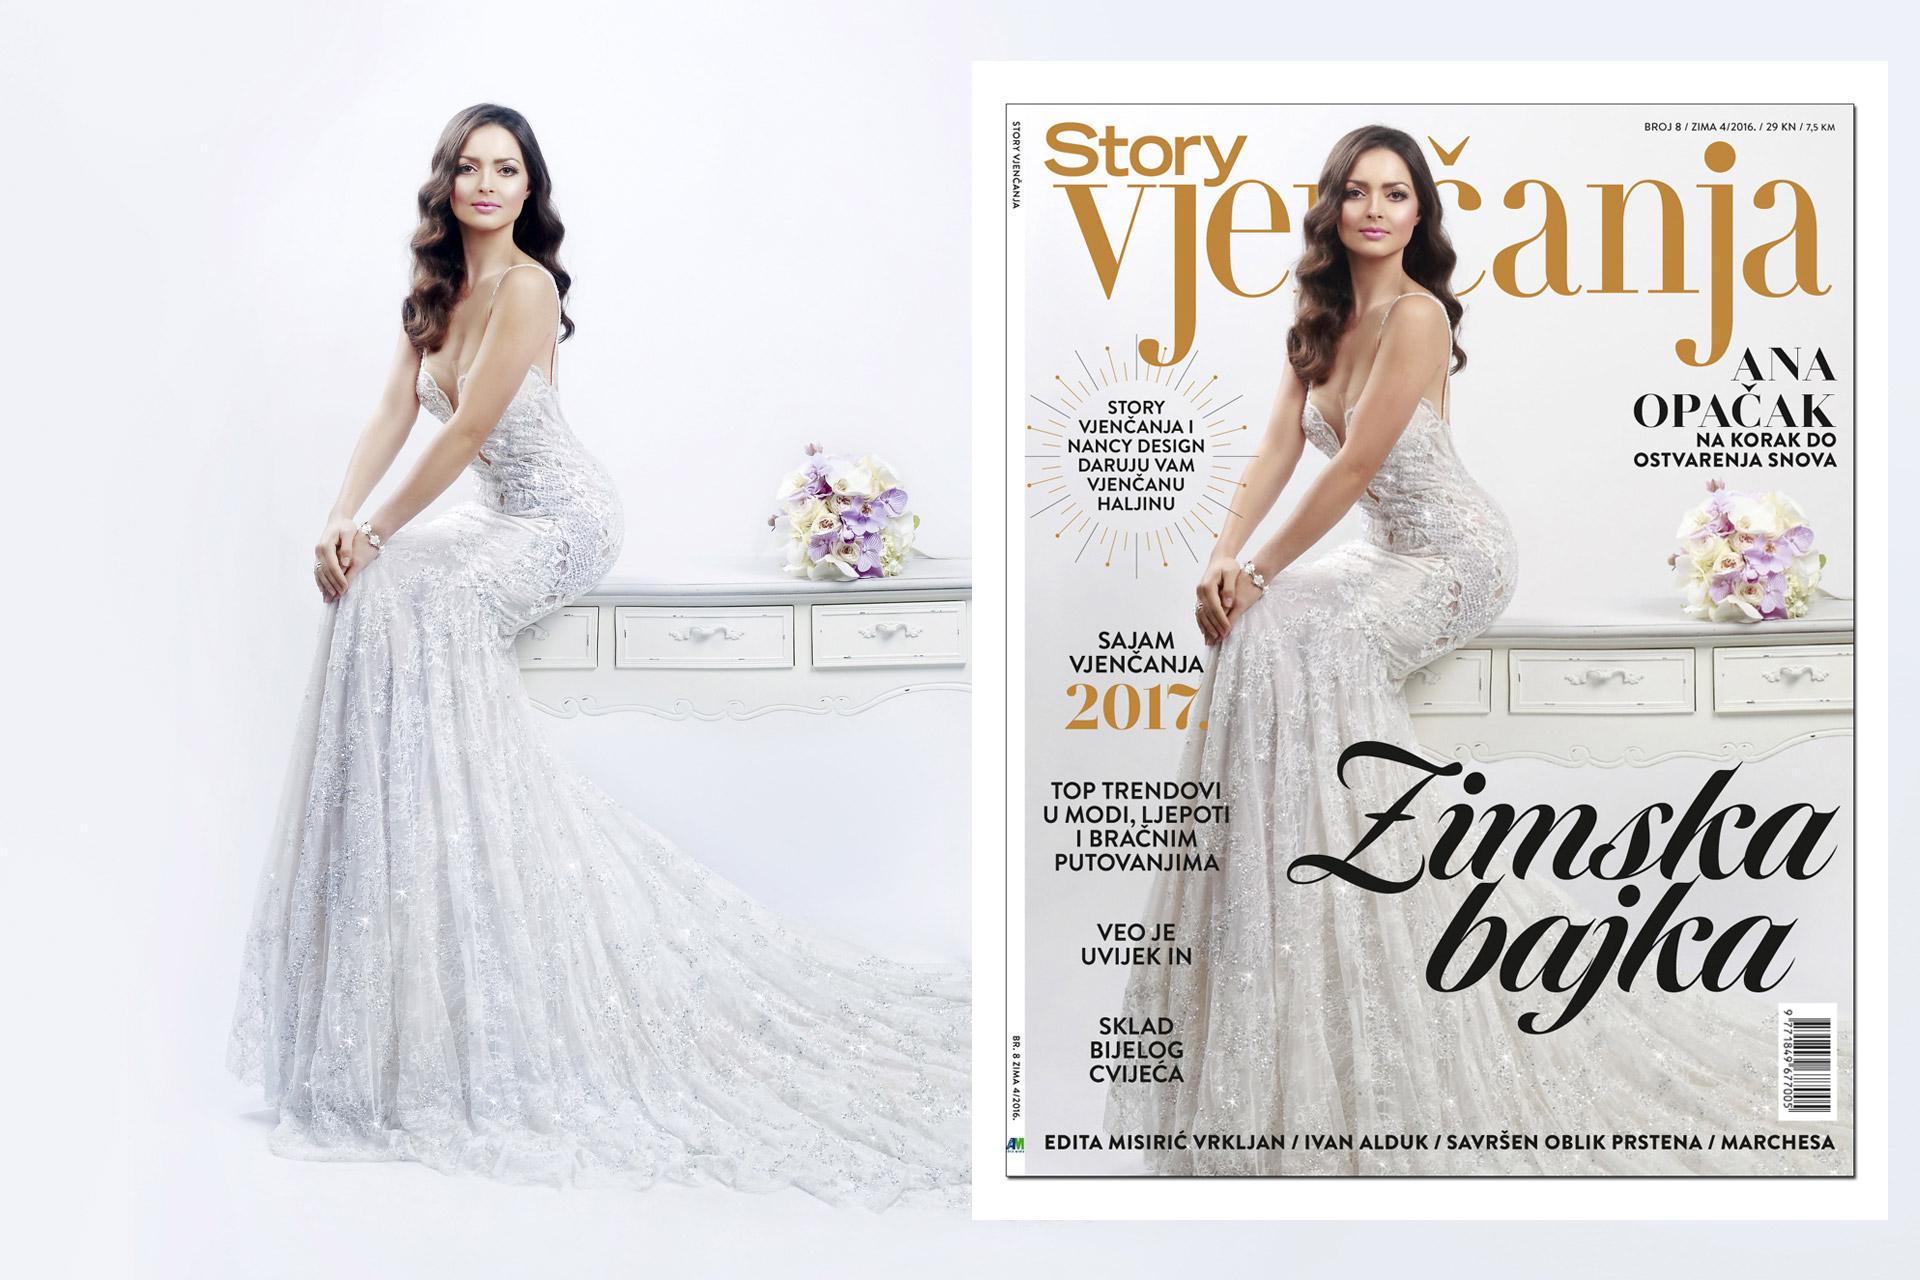 Story Vjencanja editorial, cover & bilboard shooting